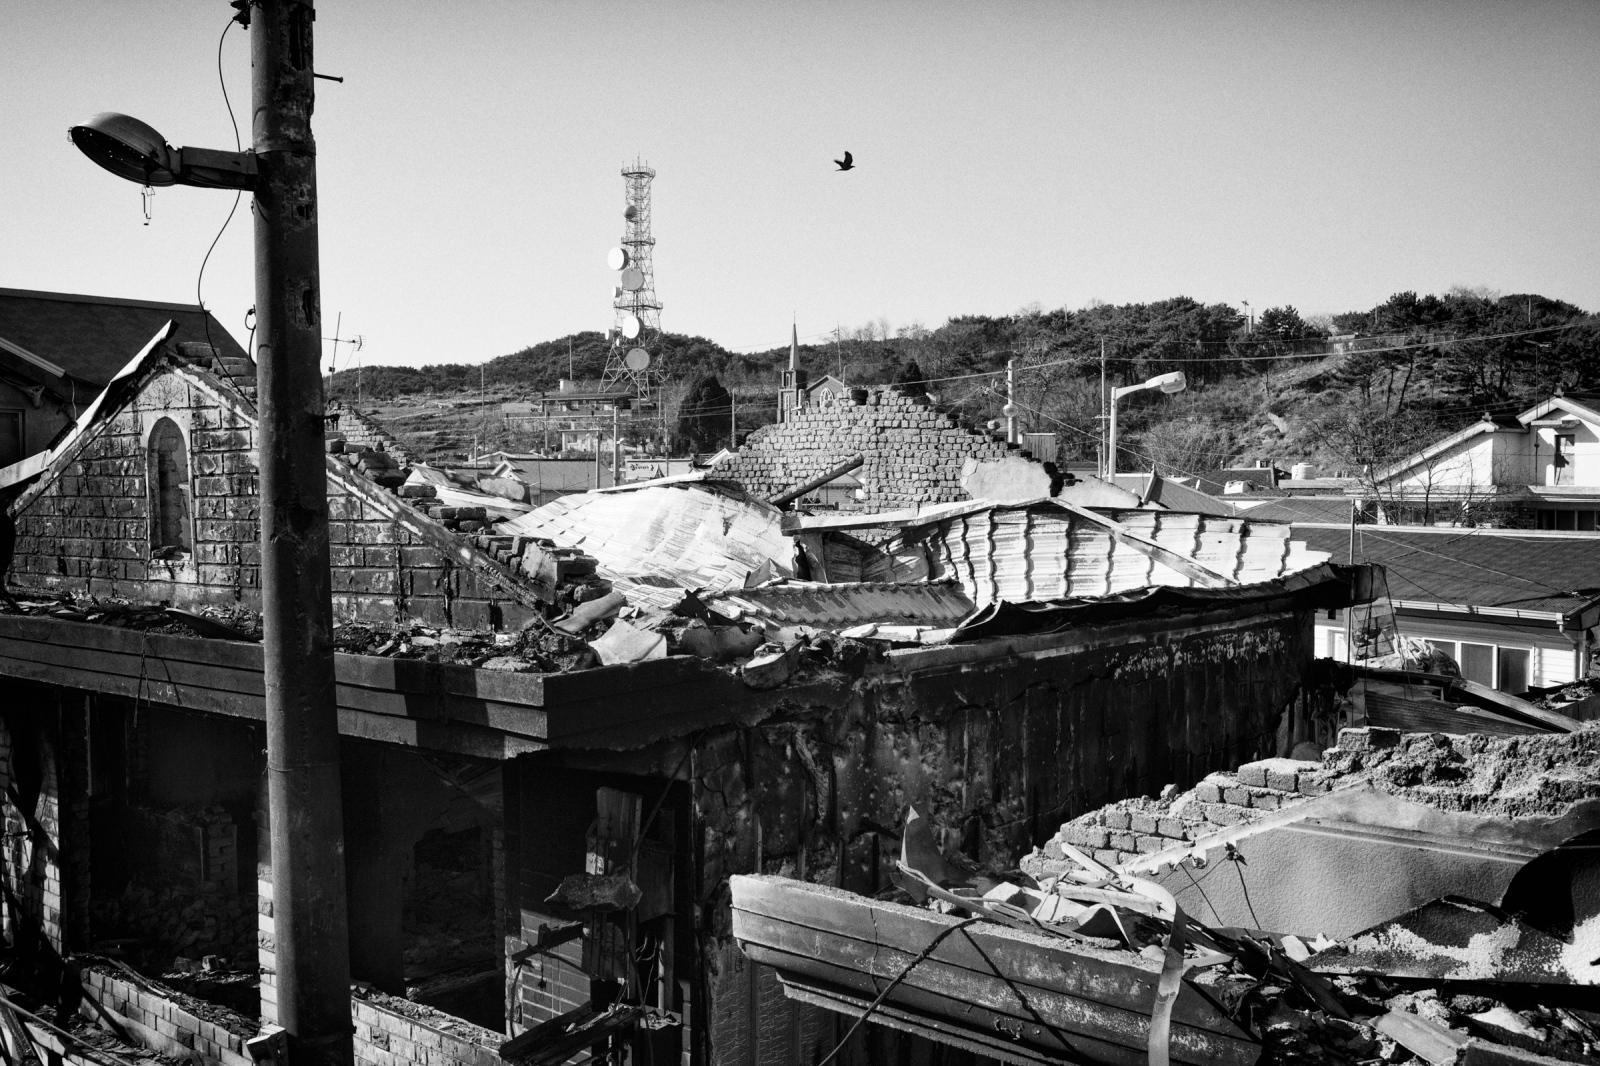 Art and Documentary Photography - Loading YeonpyeongIsland_LoRes_04.jpg